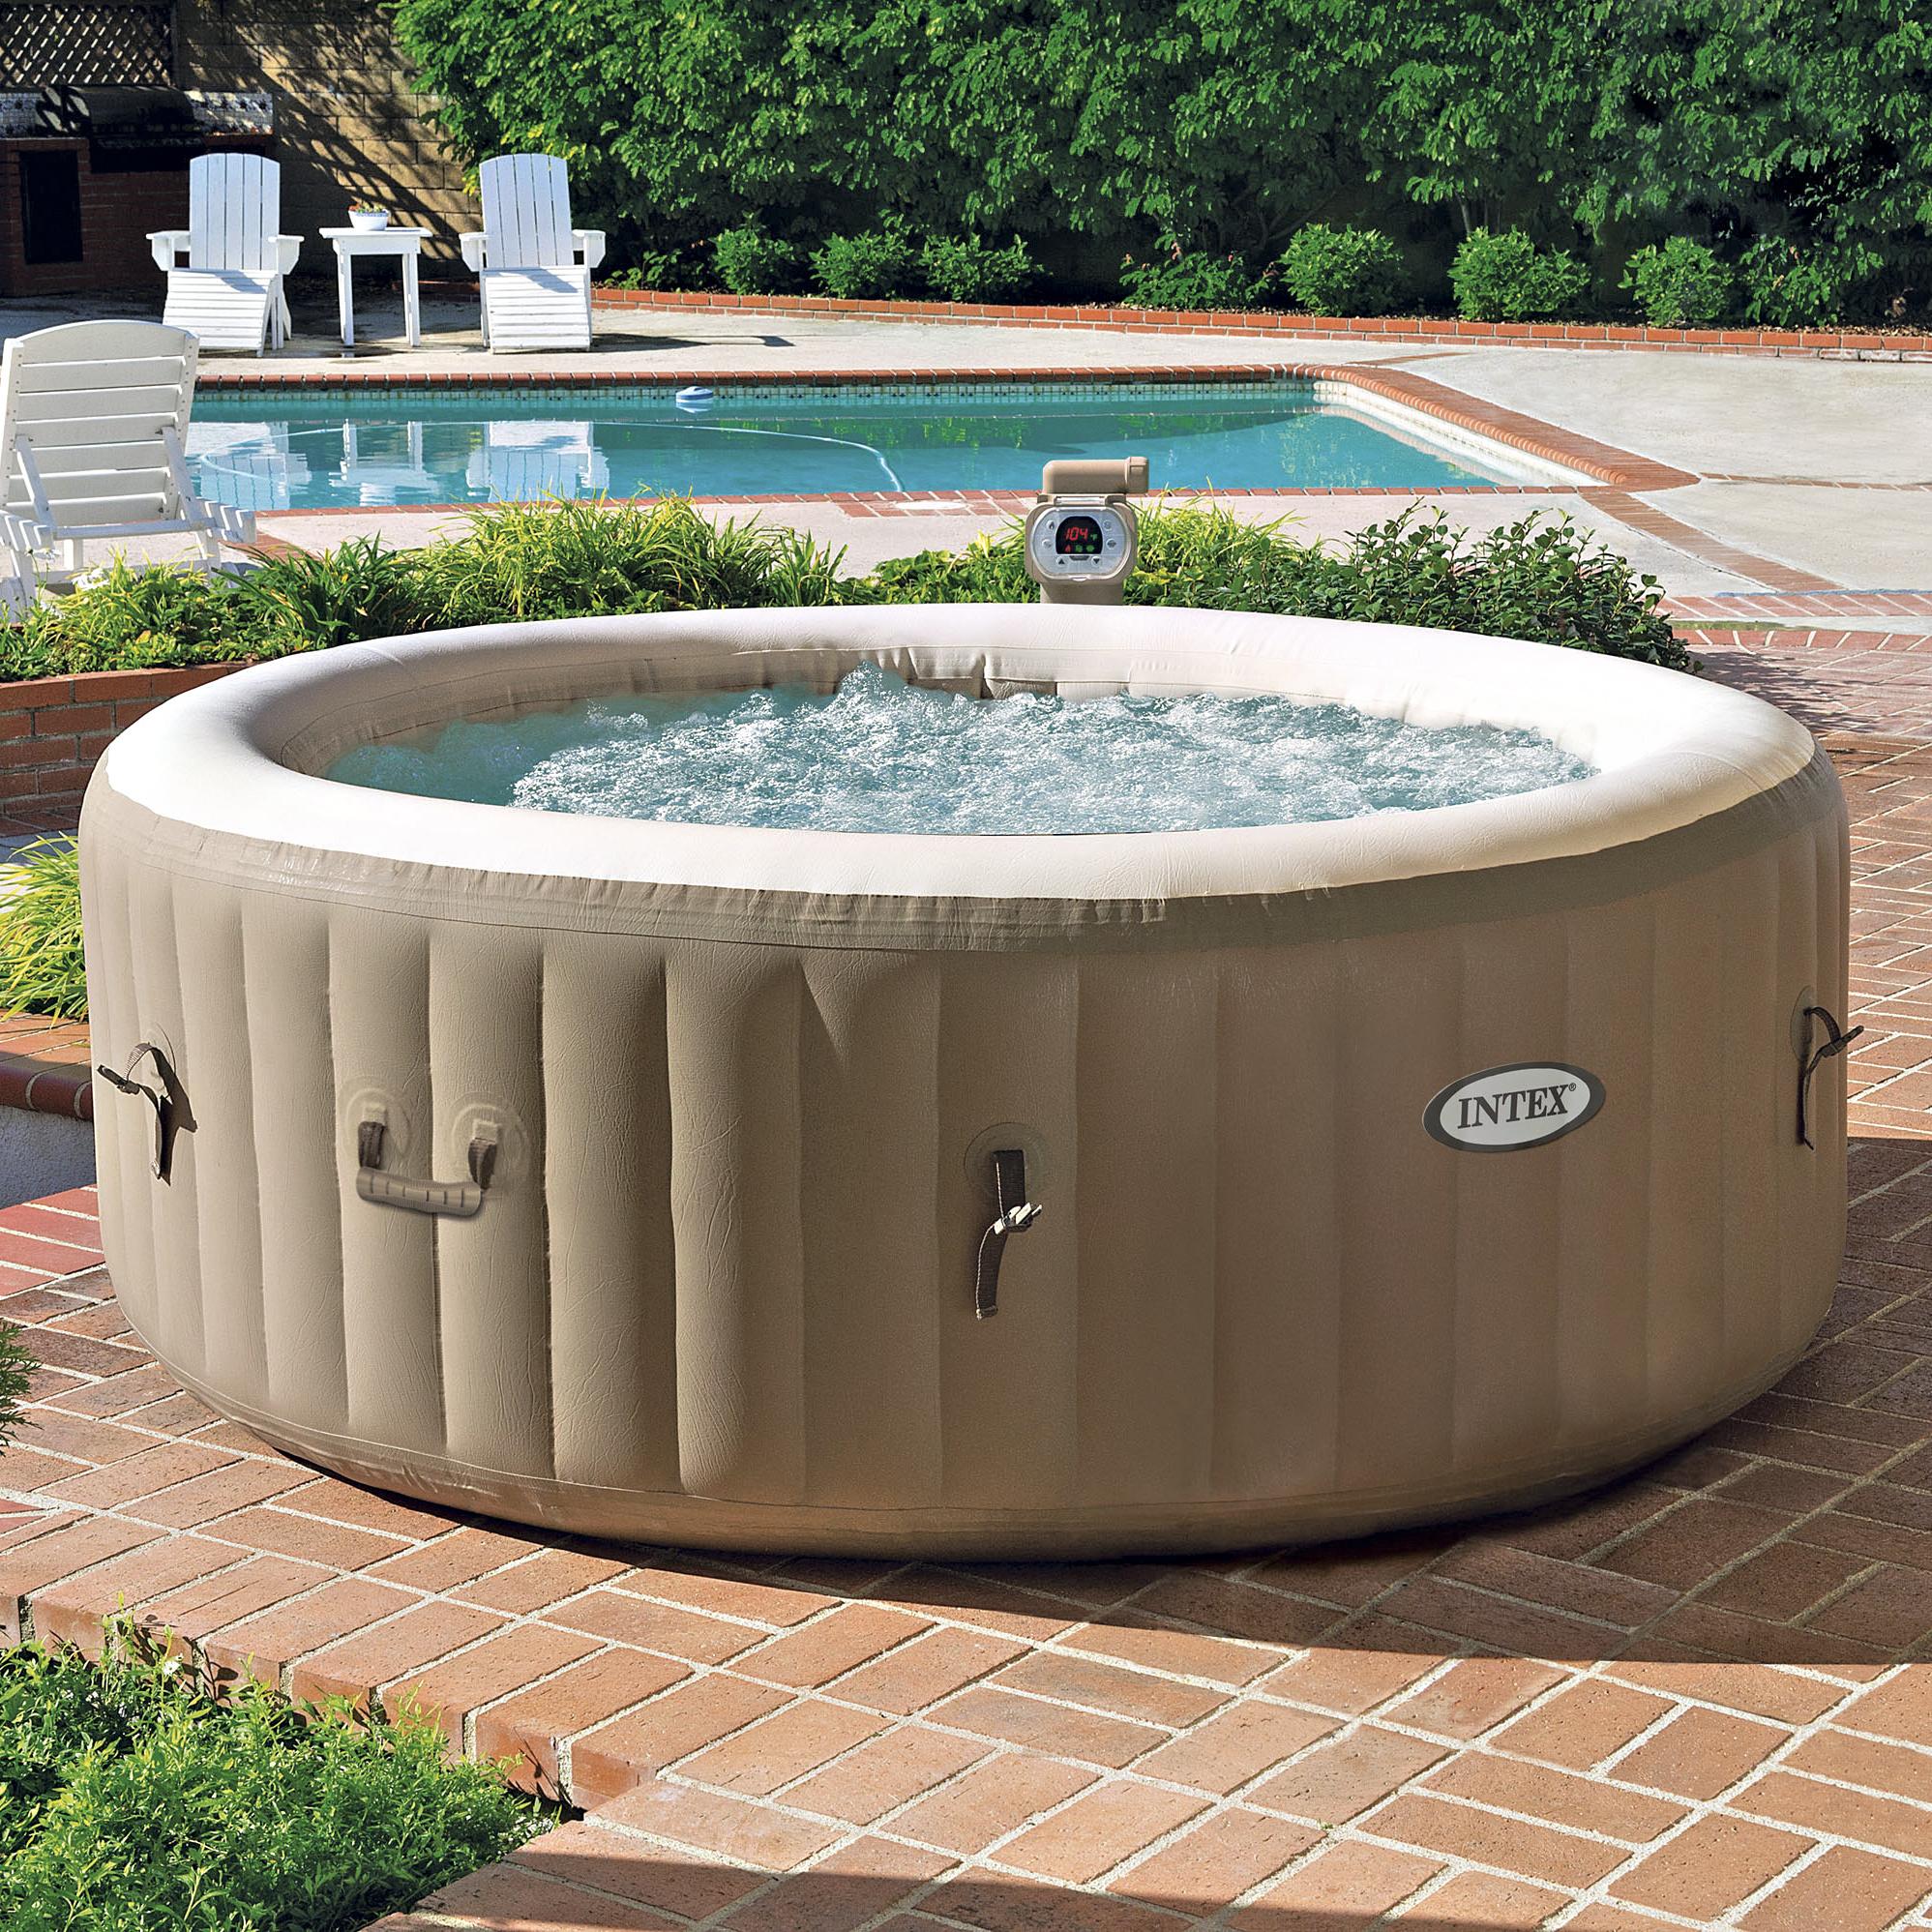 whirlpool garten aufblasbar whirlpool garten aufblasbar weegarden garten whirlpool kaufen. Black Bedroom Furniture Sets. Home Design Ideas